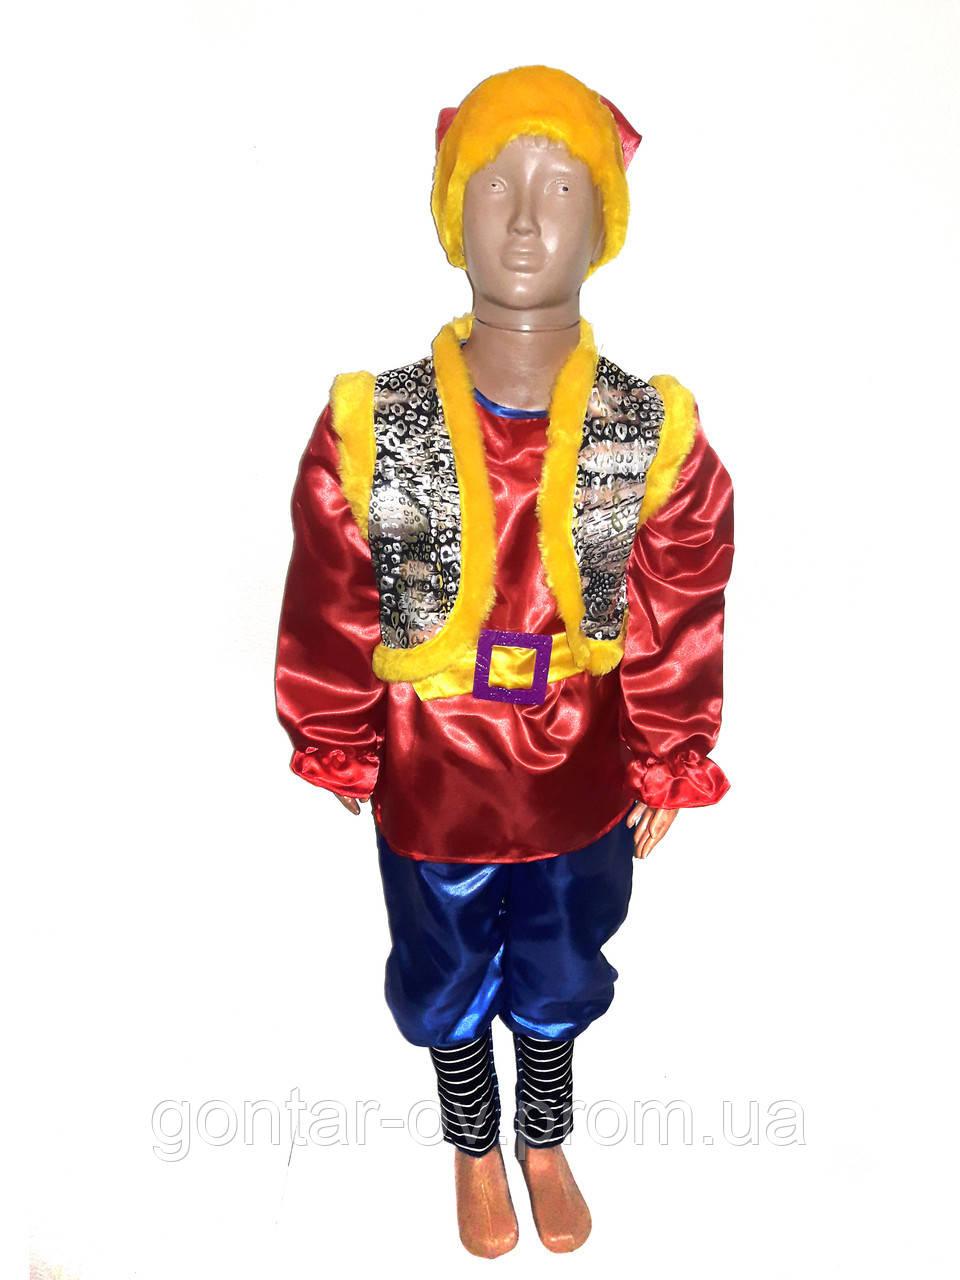 Новогодний костюм Гном Эльф Помошник Сантыик